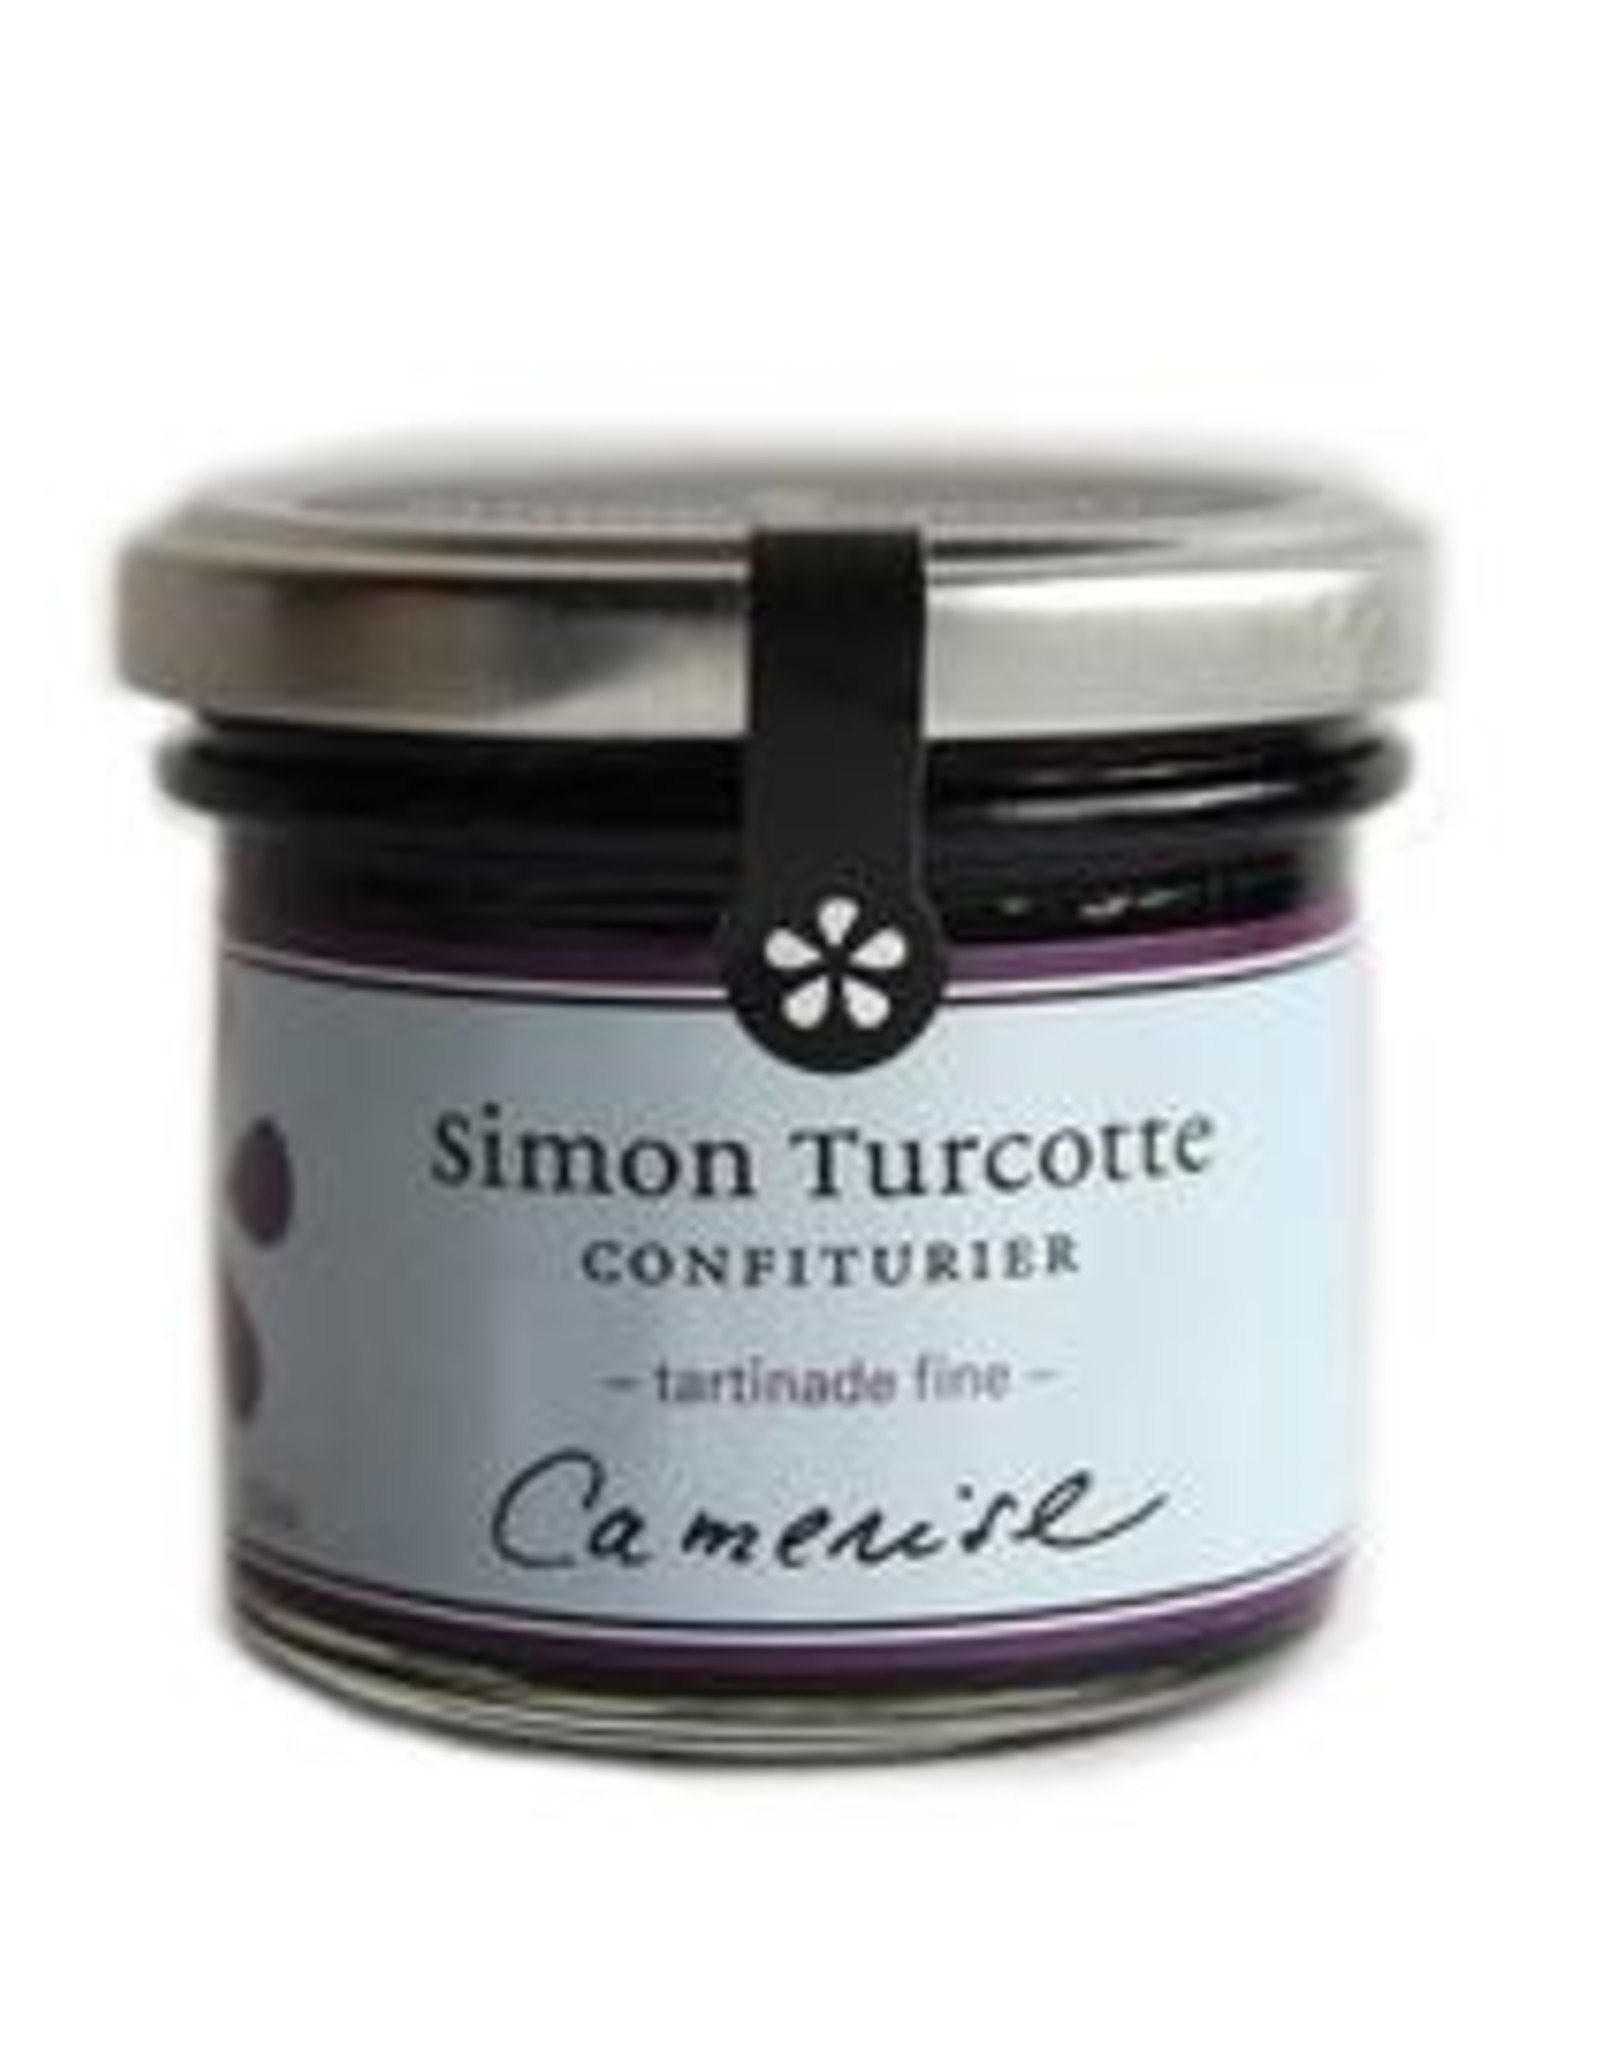 Simon Turcotte confiturier Tartinade Camerise